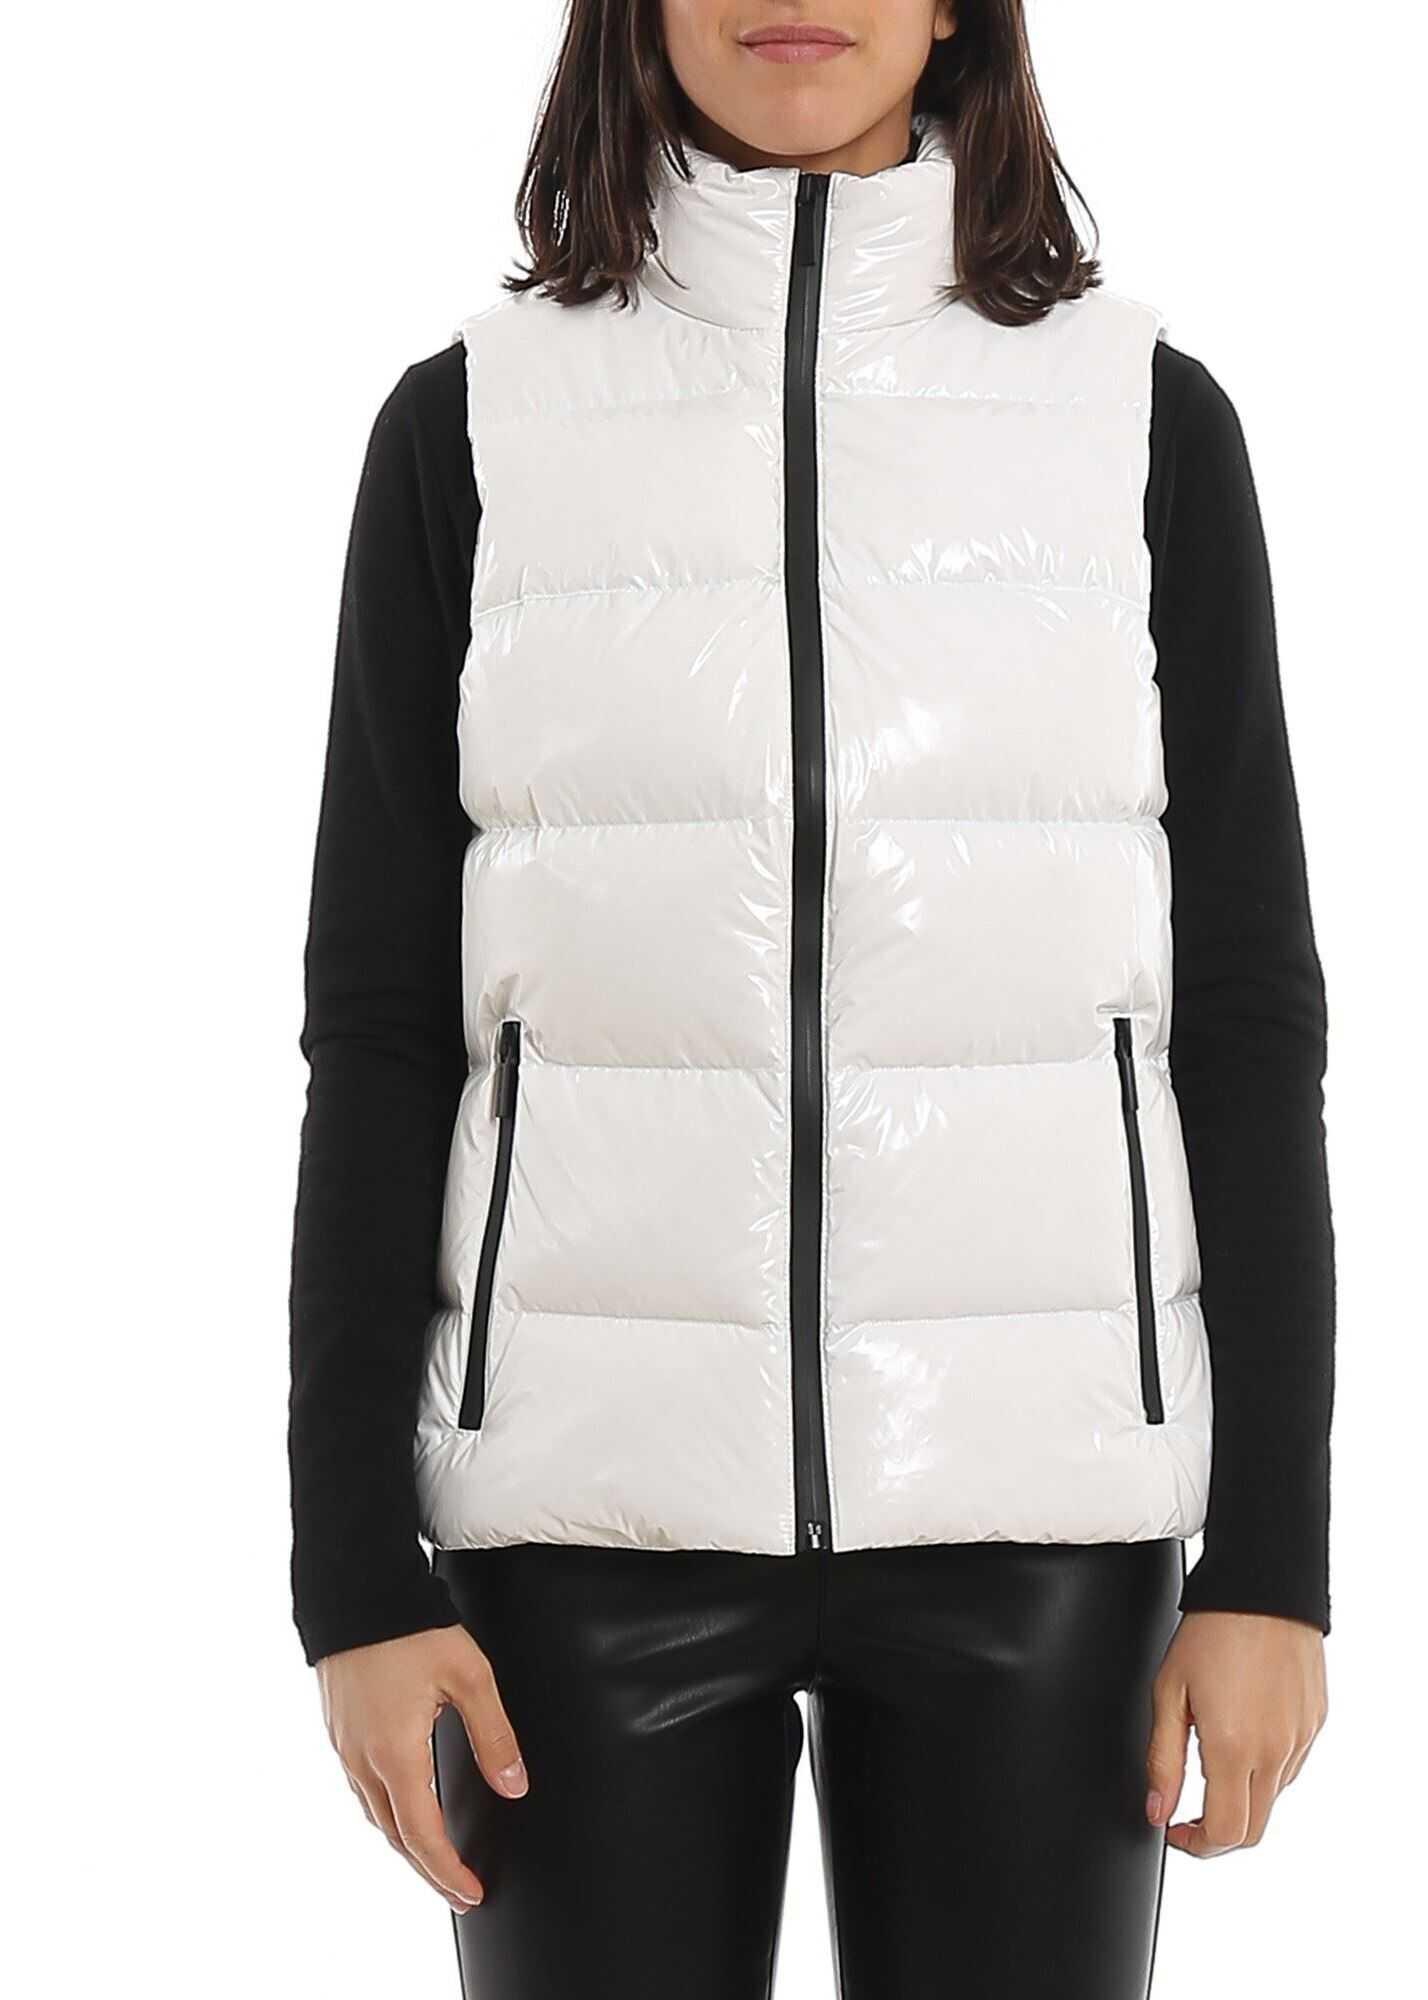 Michael Kors Sleeveless Padded Jacket White